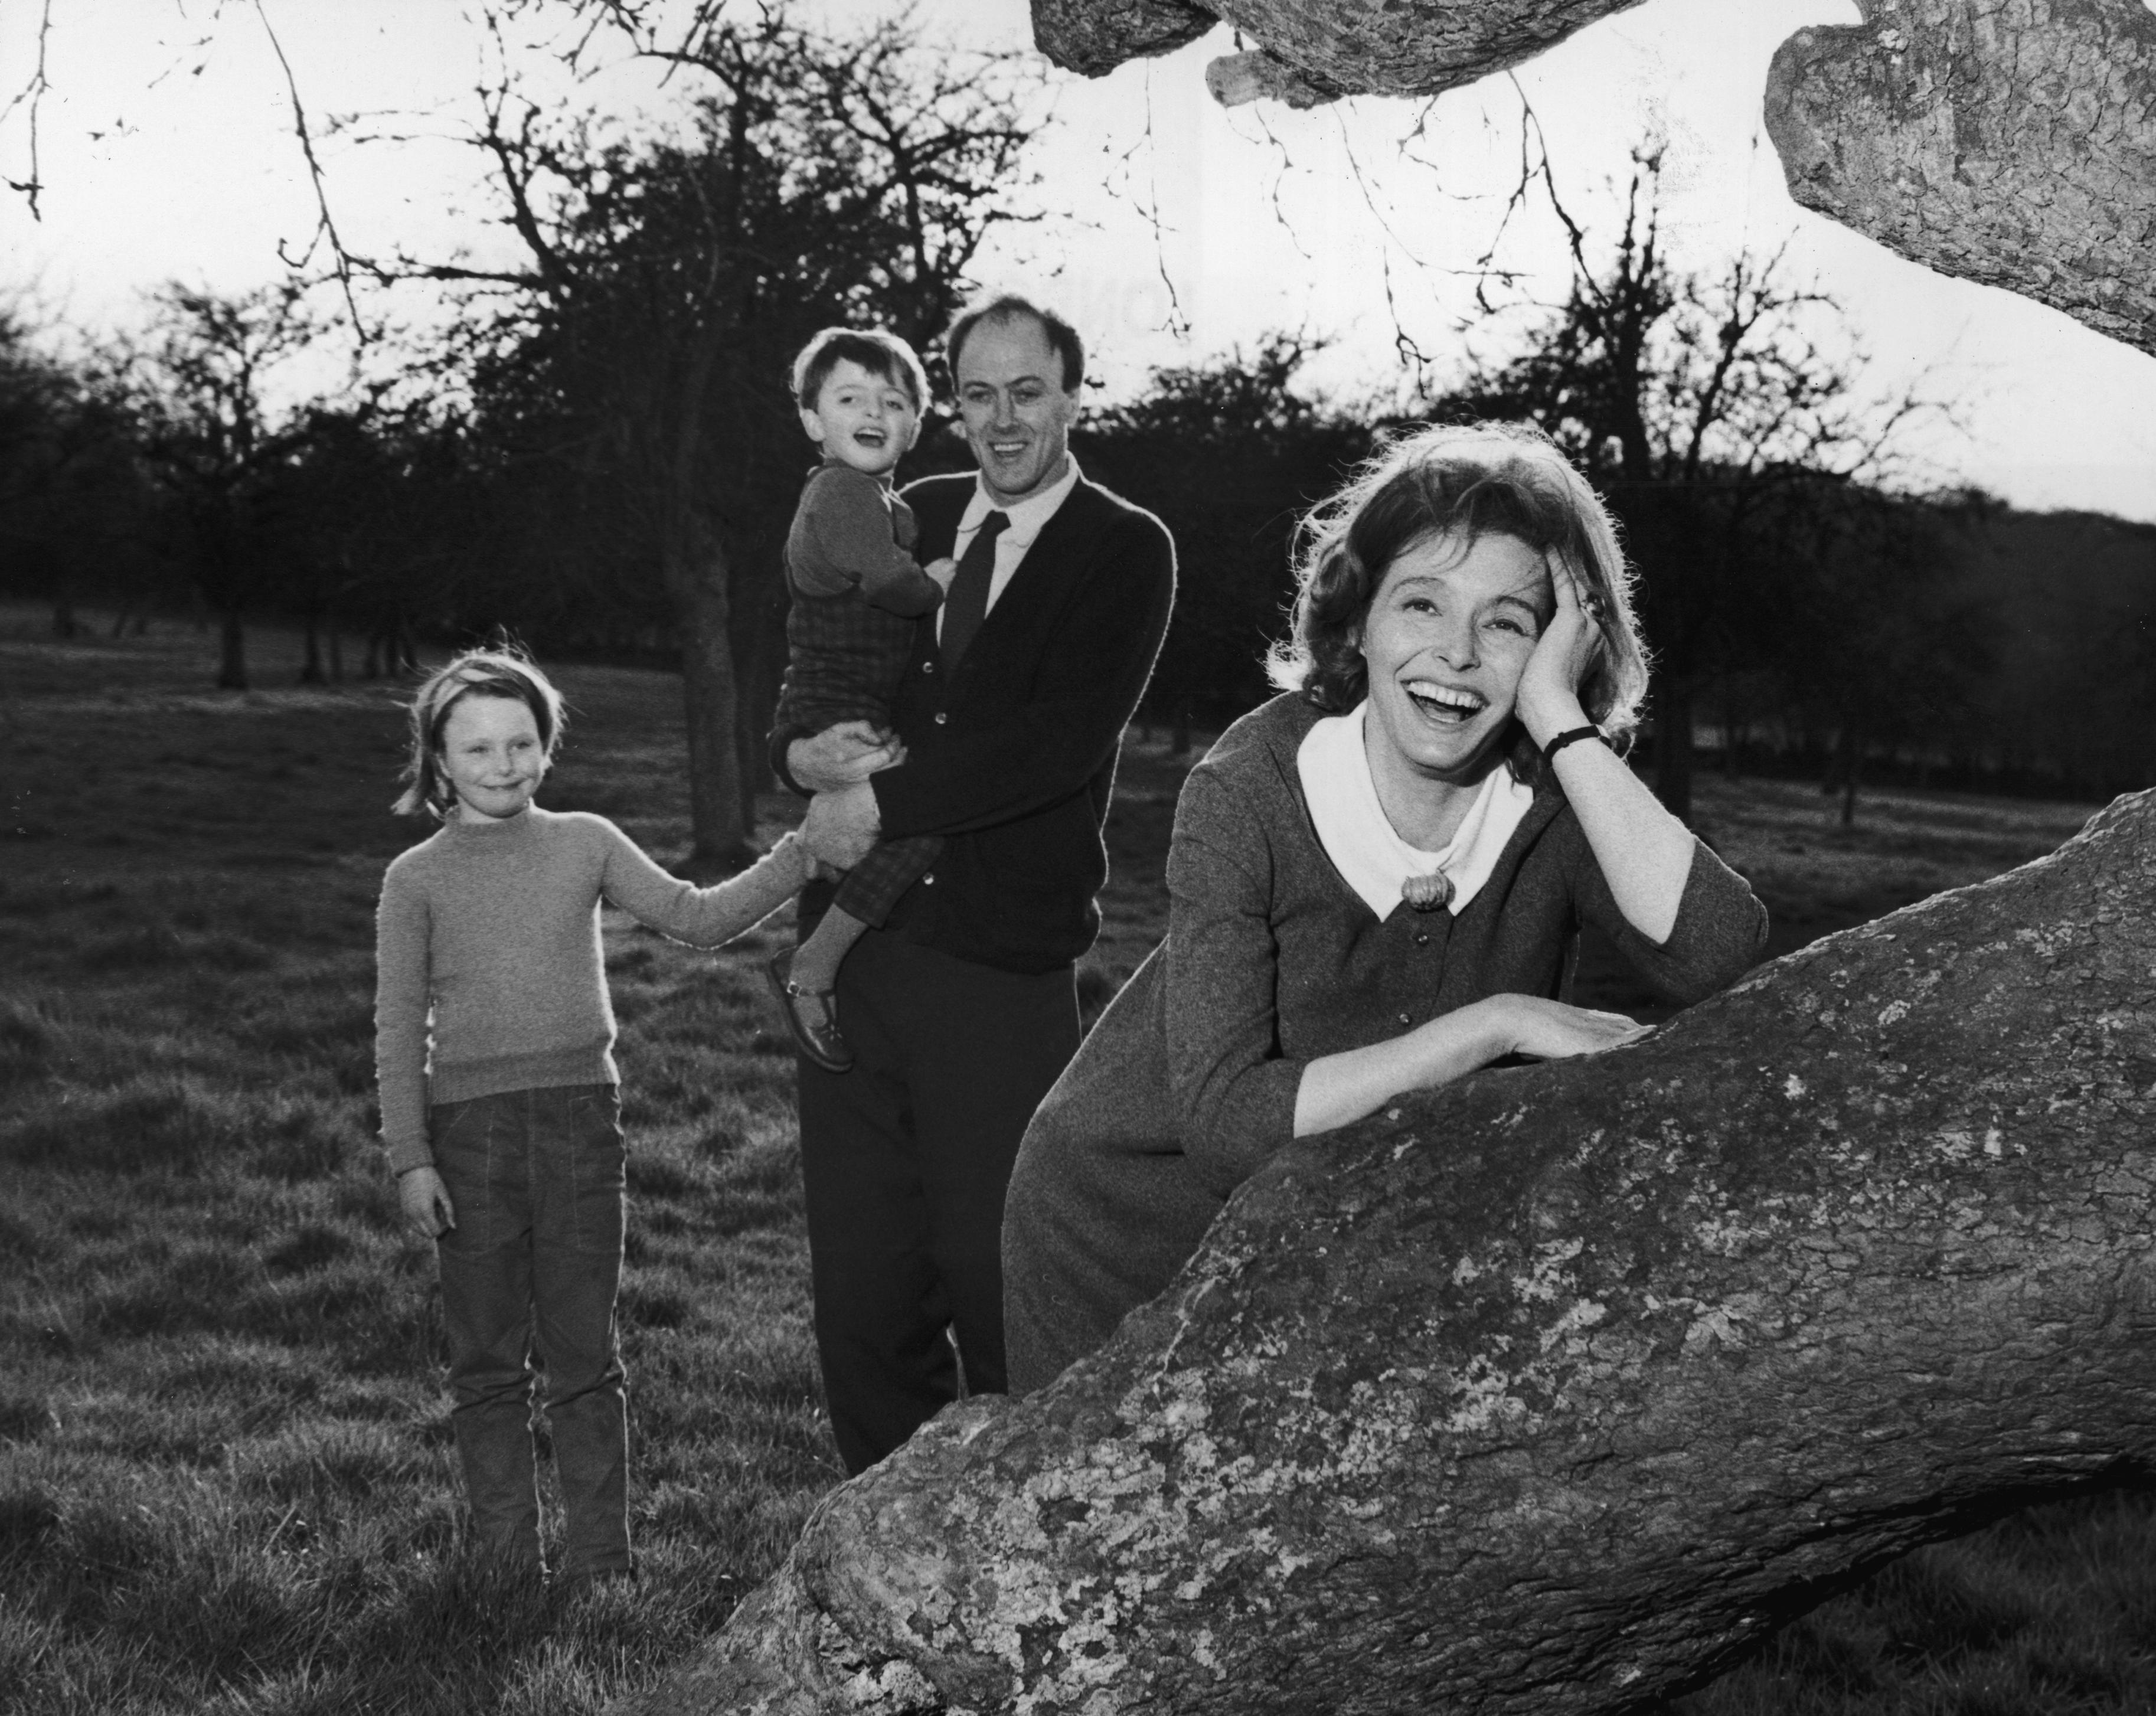 Patricia Neal/Roald Dahl Biopic In Works